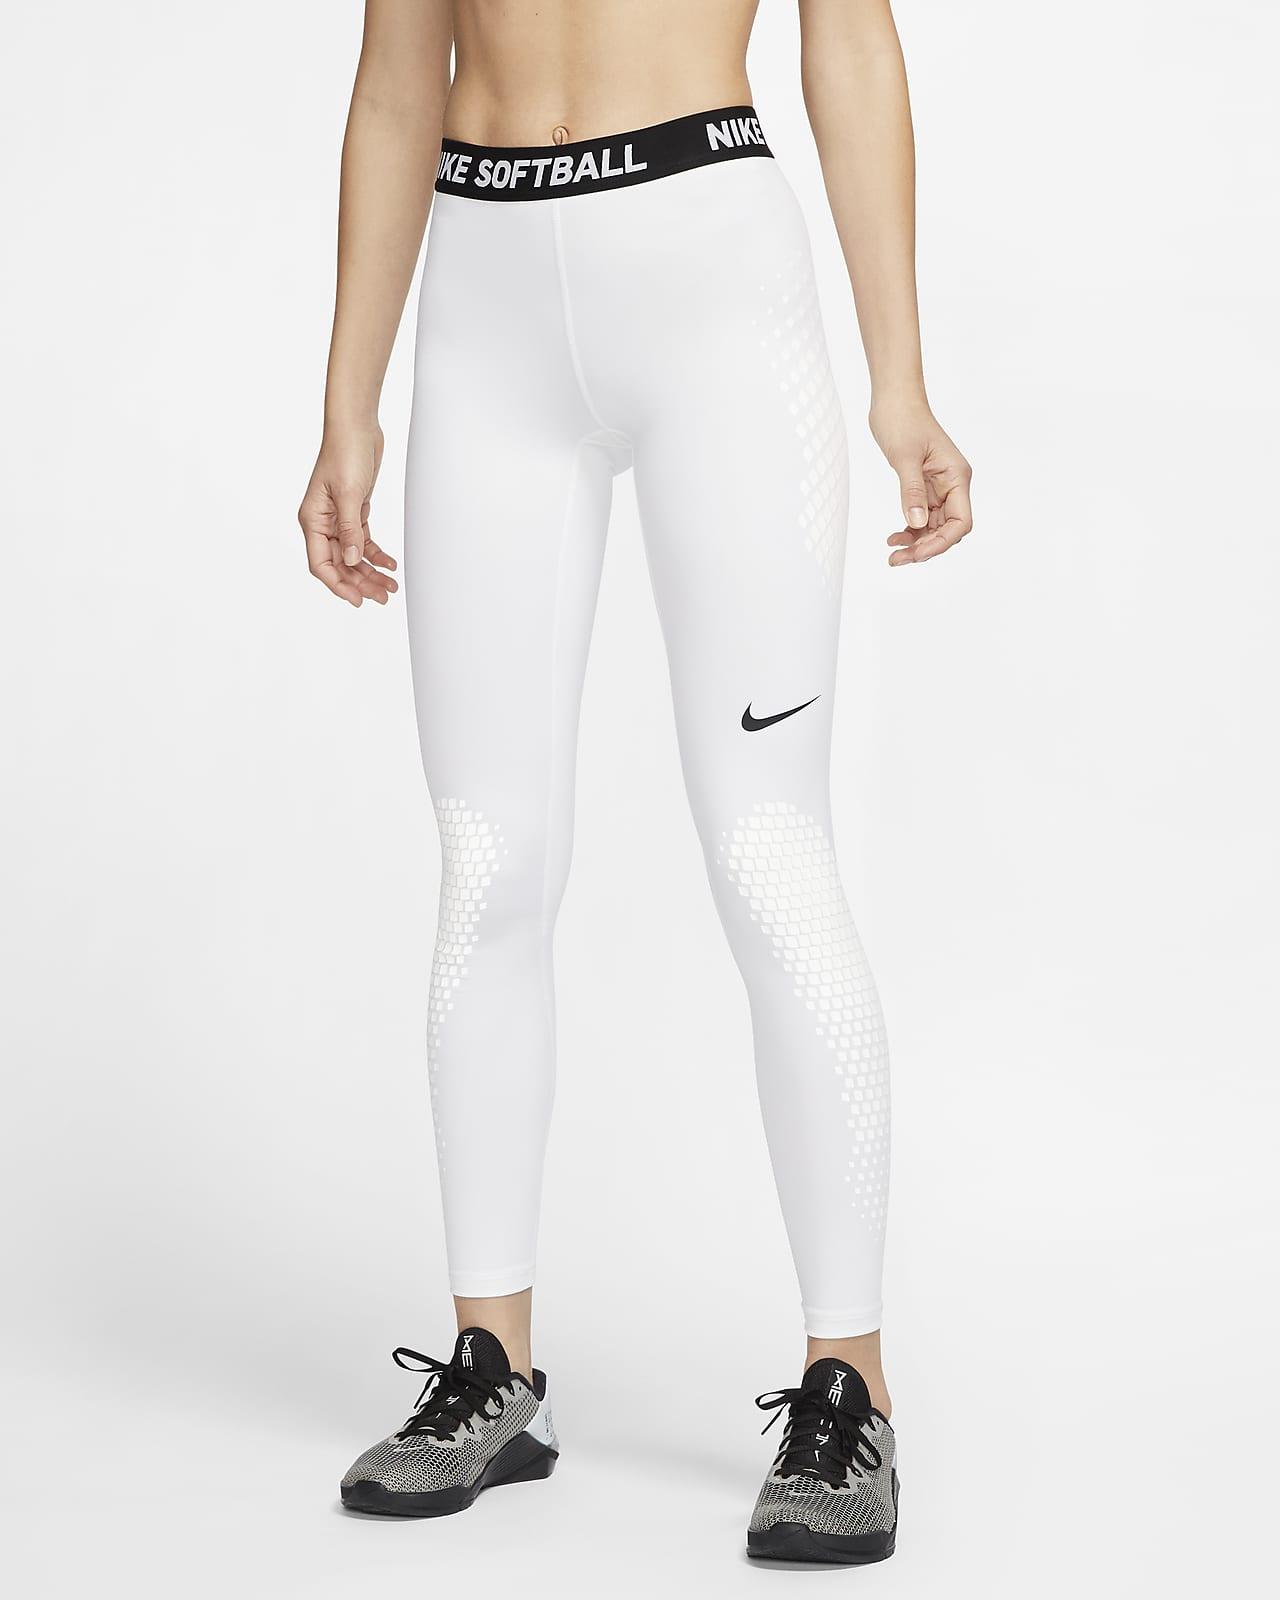 Nike Dri-FIT Vapor Women's Slider Softball Tights (Stock)